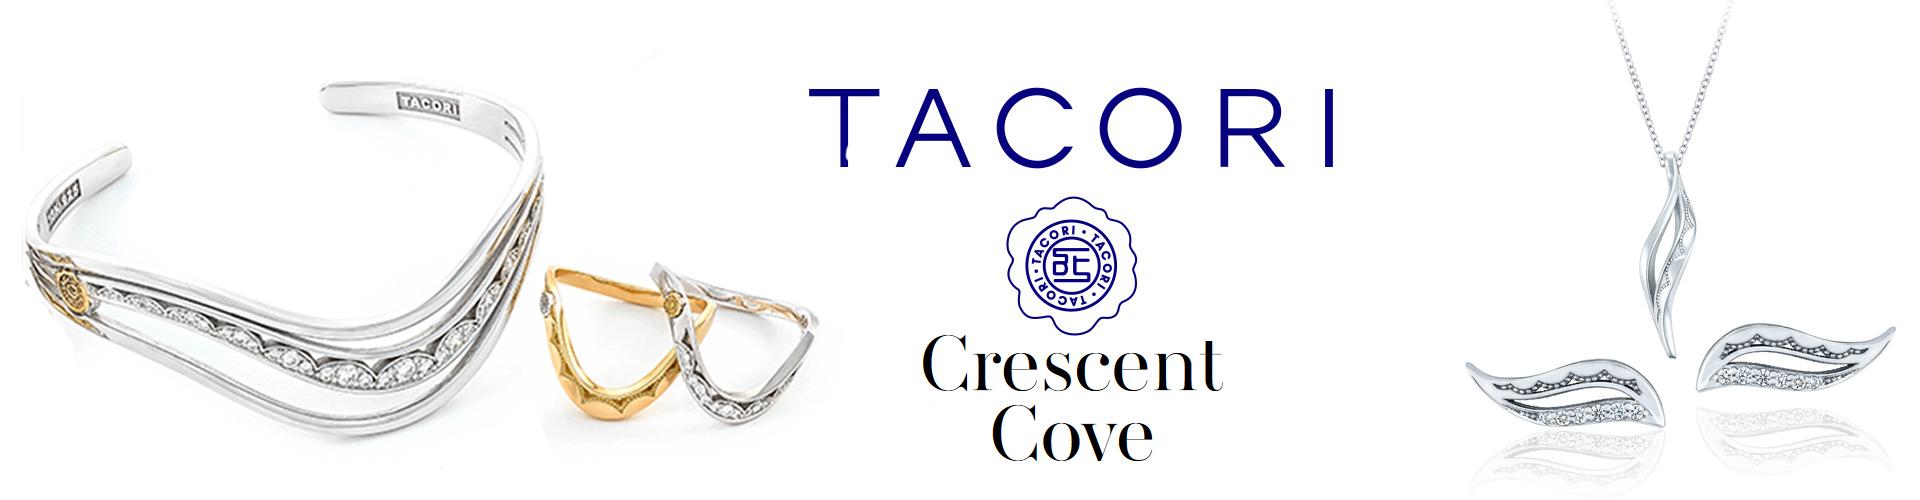 Crescent Cove